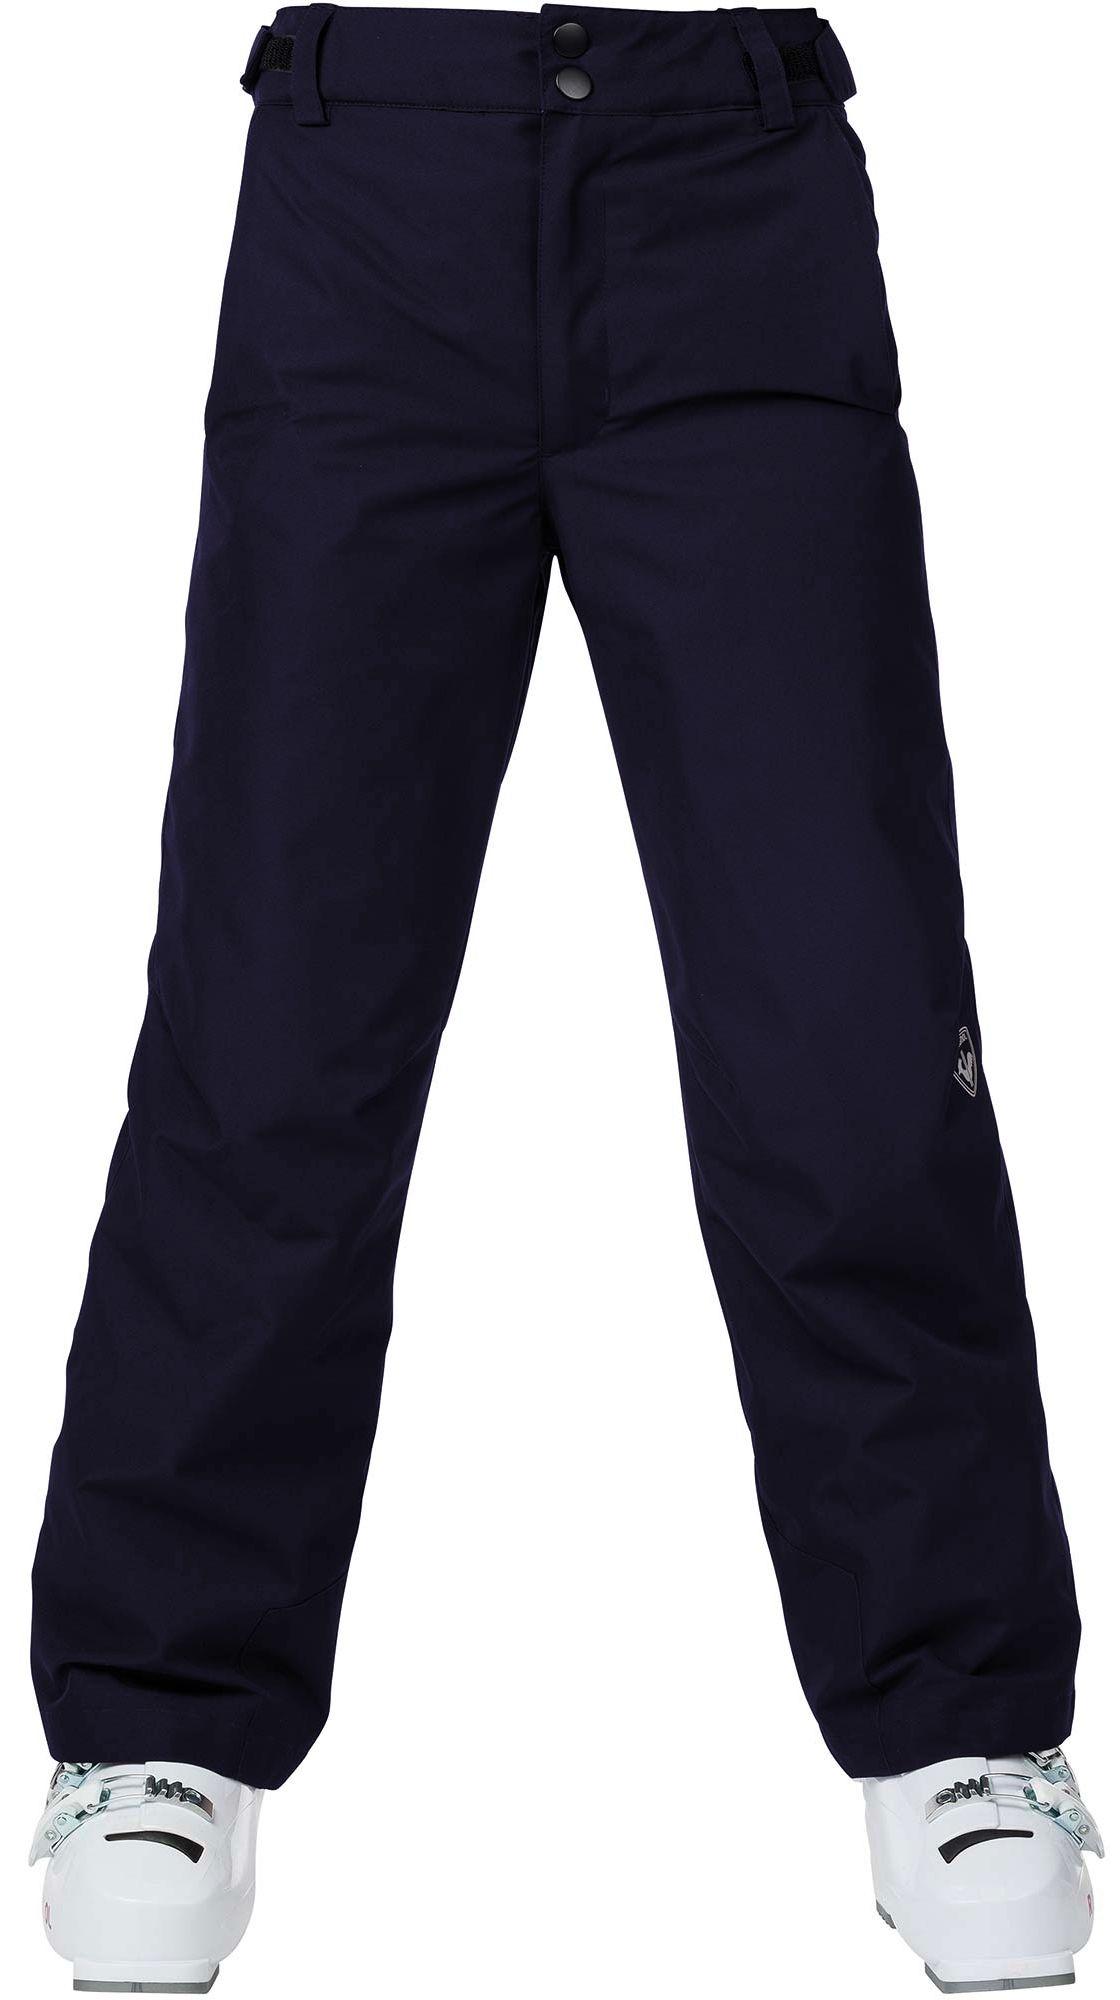 0ec319529 ROSSIGNOL Spodnie juniorskie Boy Ski Pant eclipse